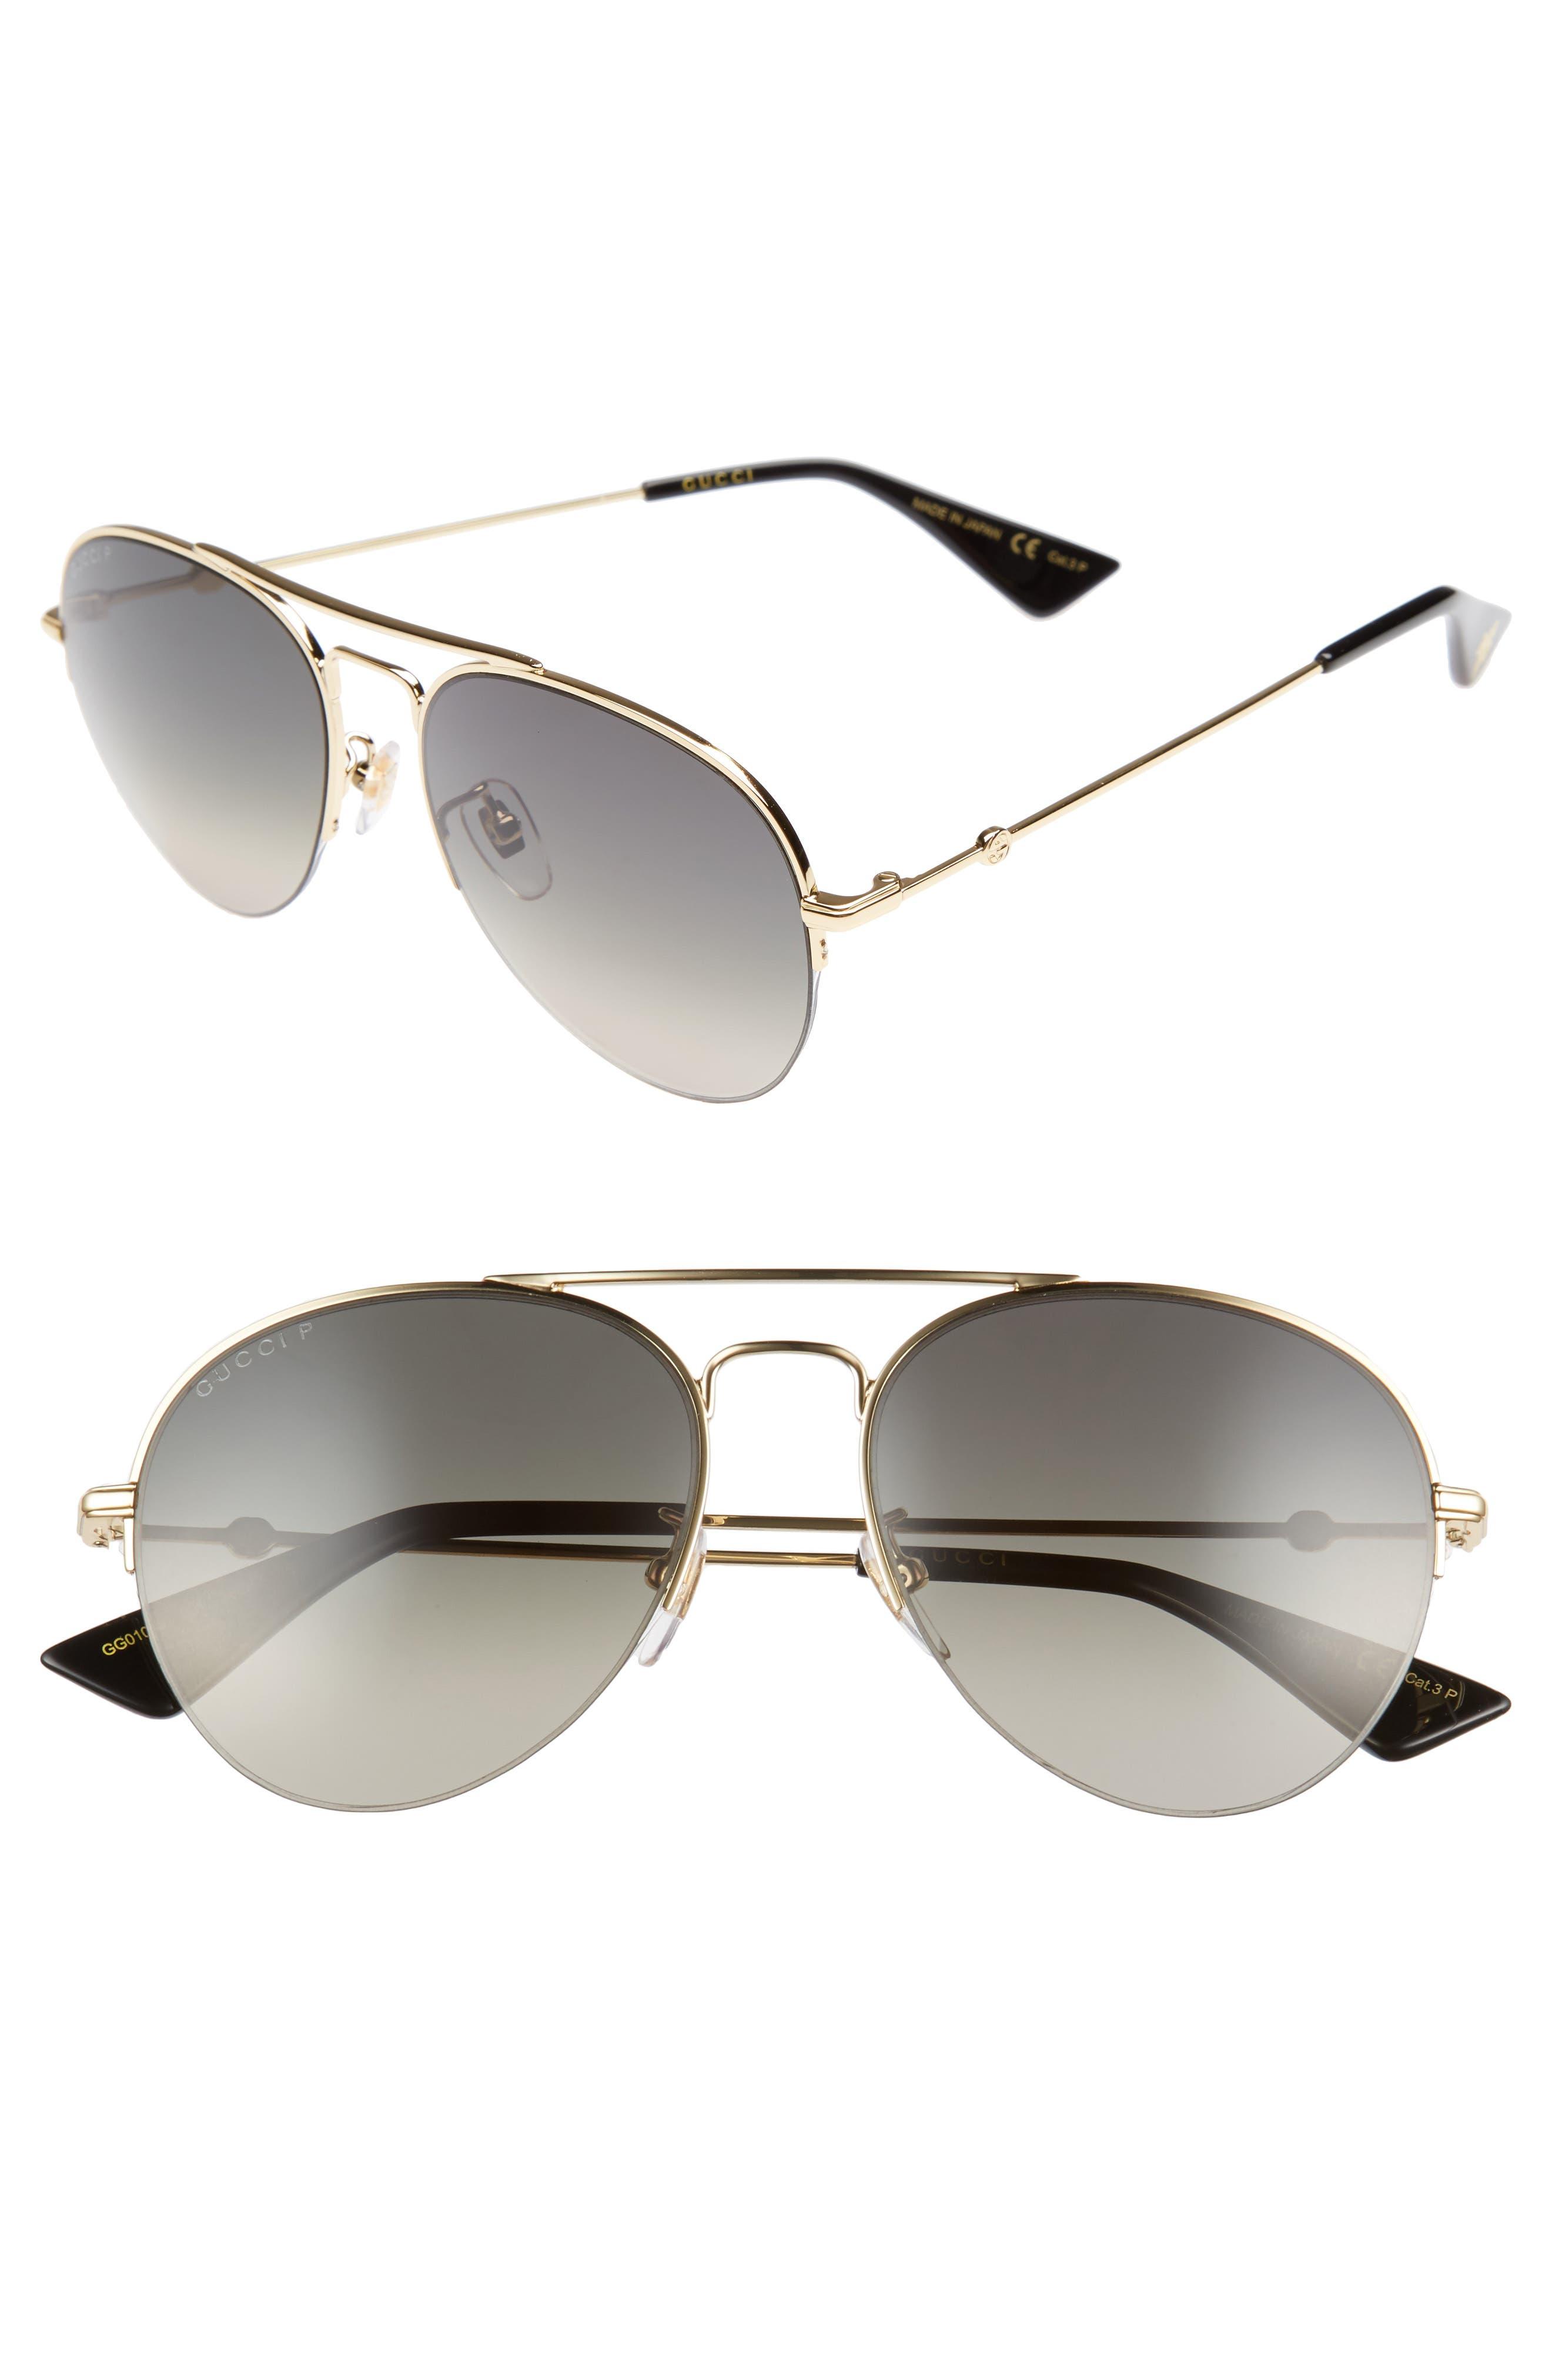 Gucci Pilot 56mm Aviator Sunglasses